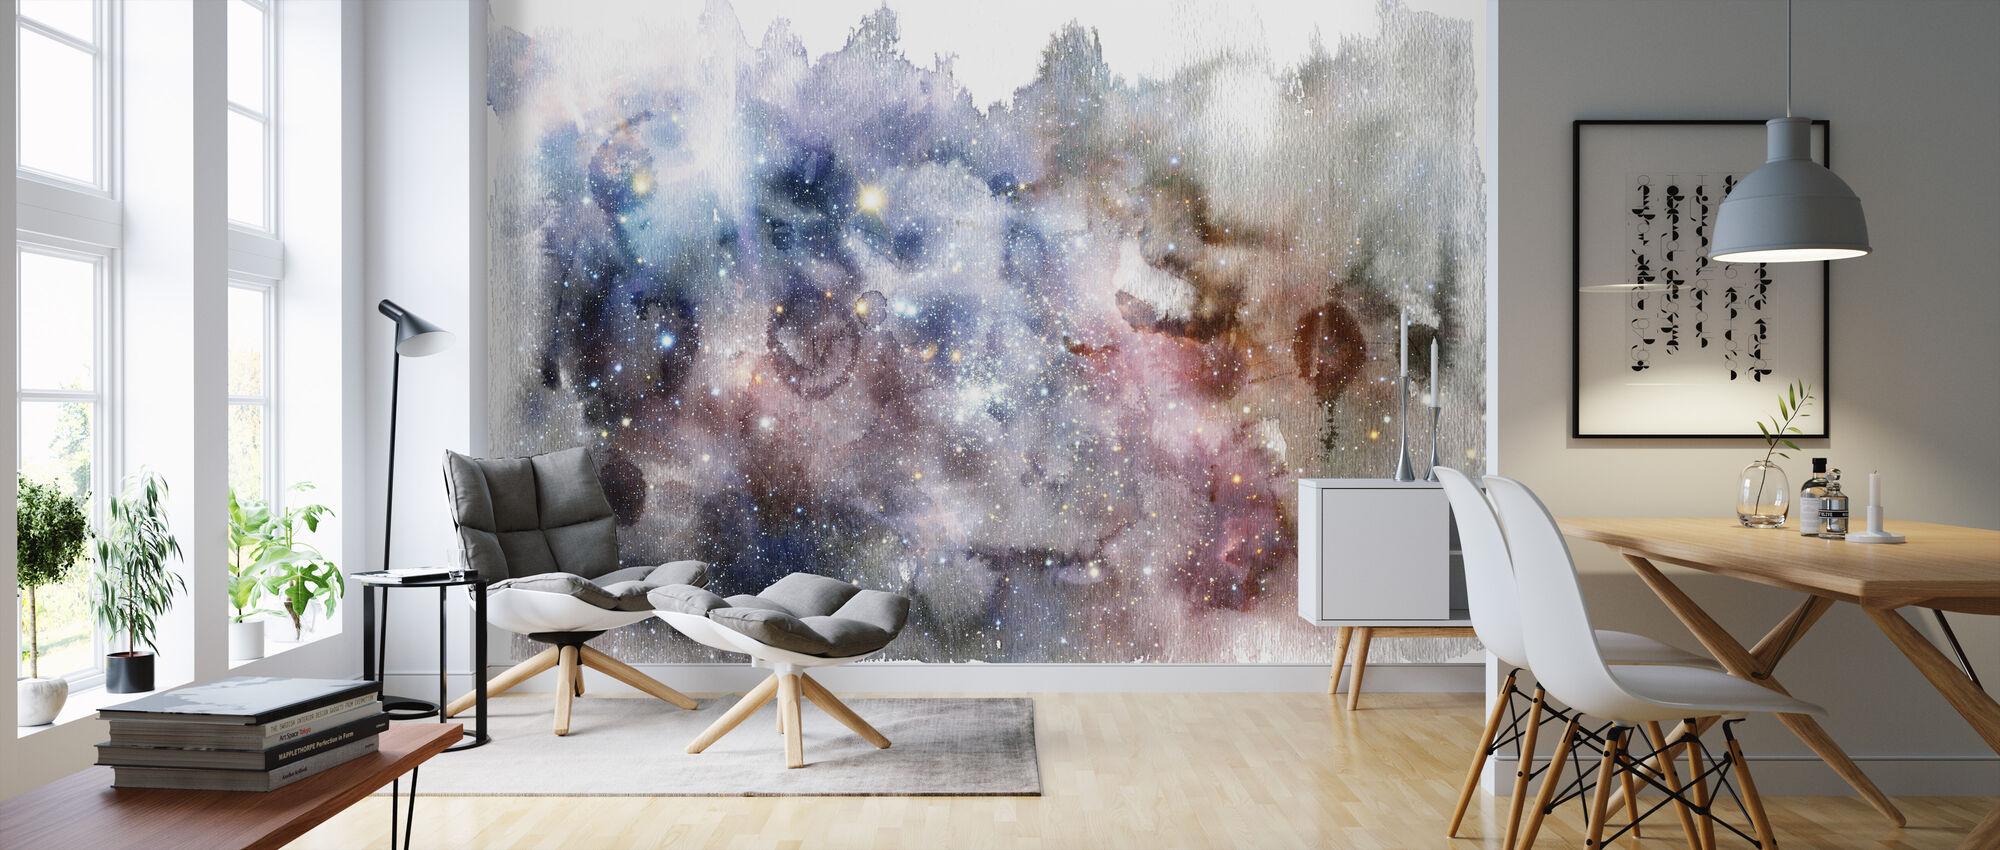 Watercolor Galaxy V - Wallpaper - Living Room